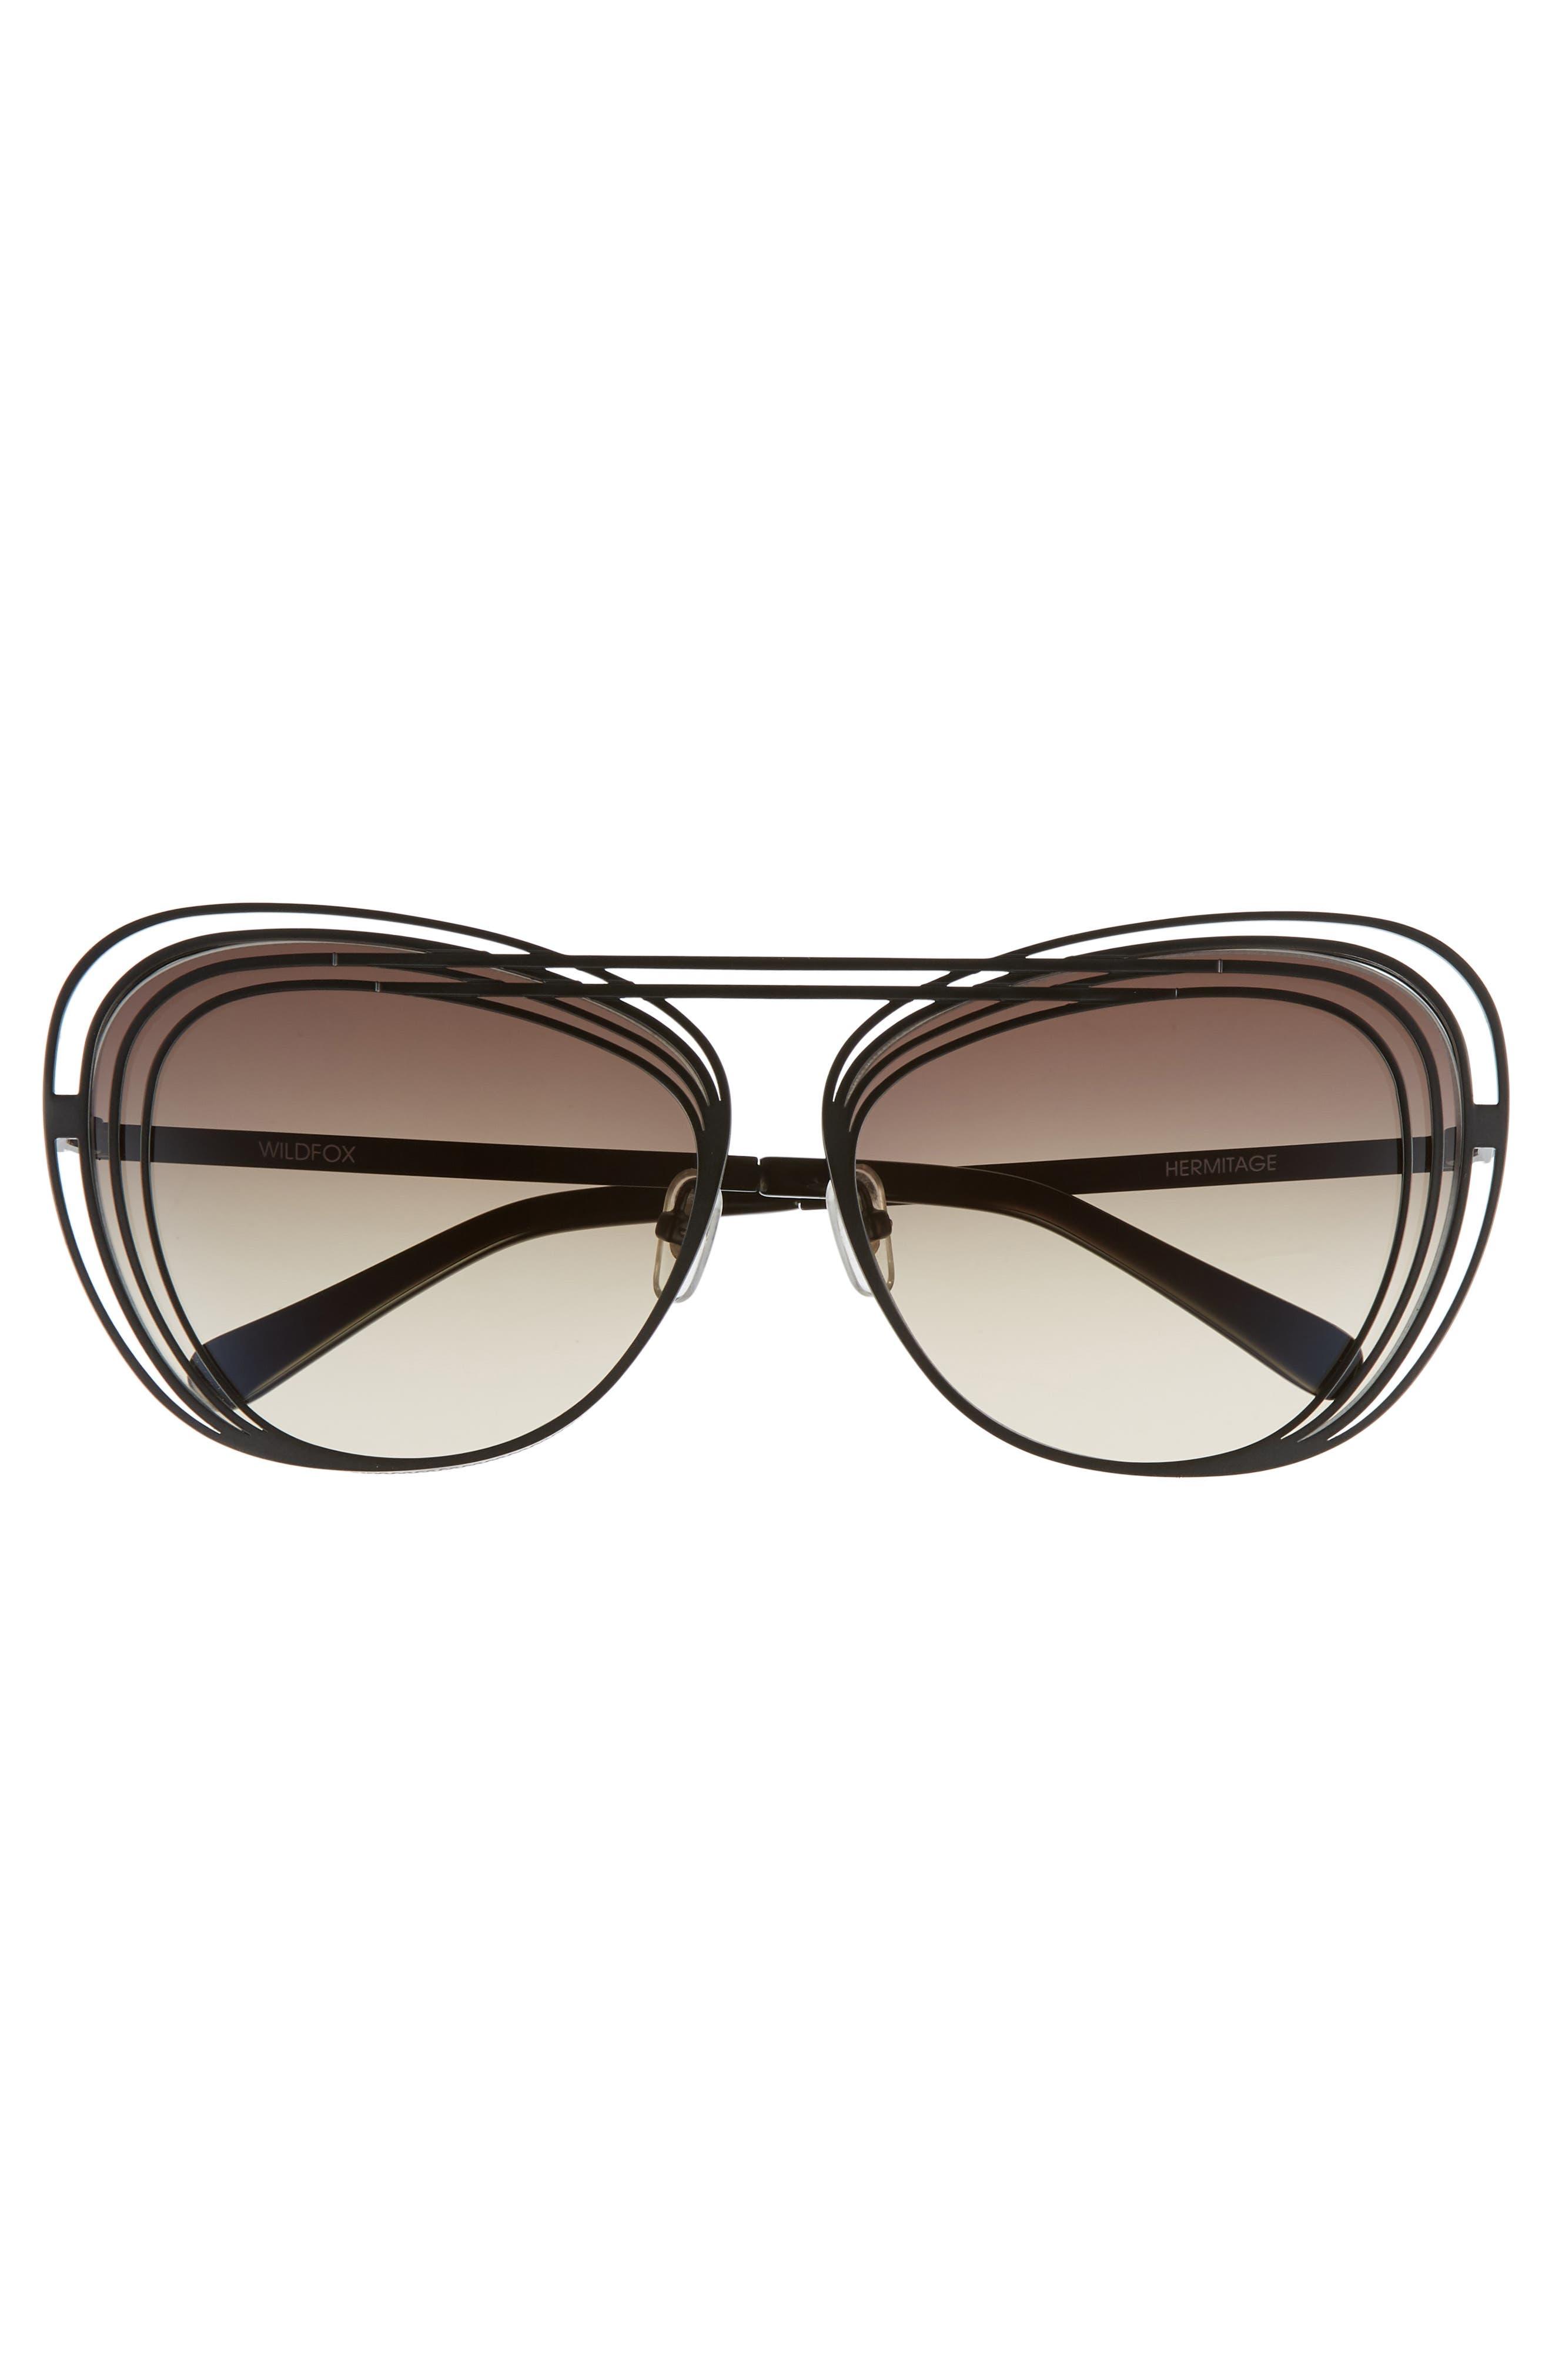 Hermitage 61mm Cat Eye Sunglasses,                             Alternate thumbnail 3, color,                             MATTE BLACK/ GREY GRADIENT